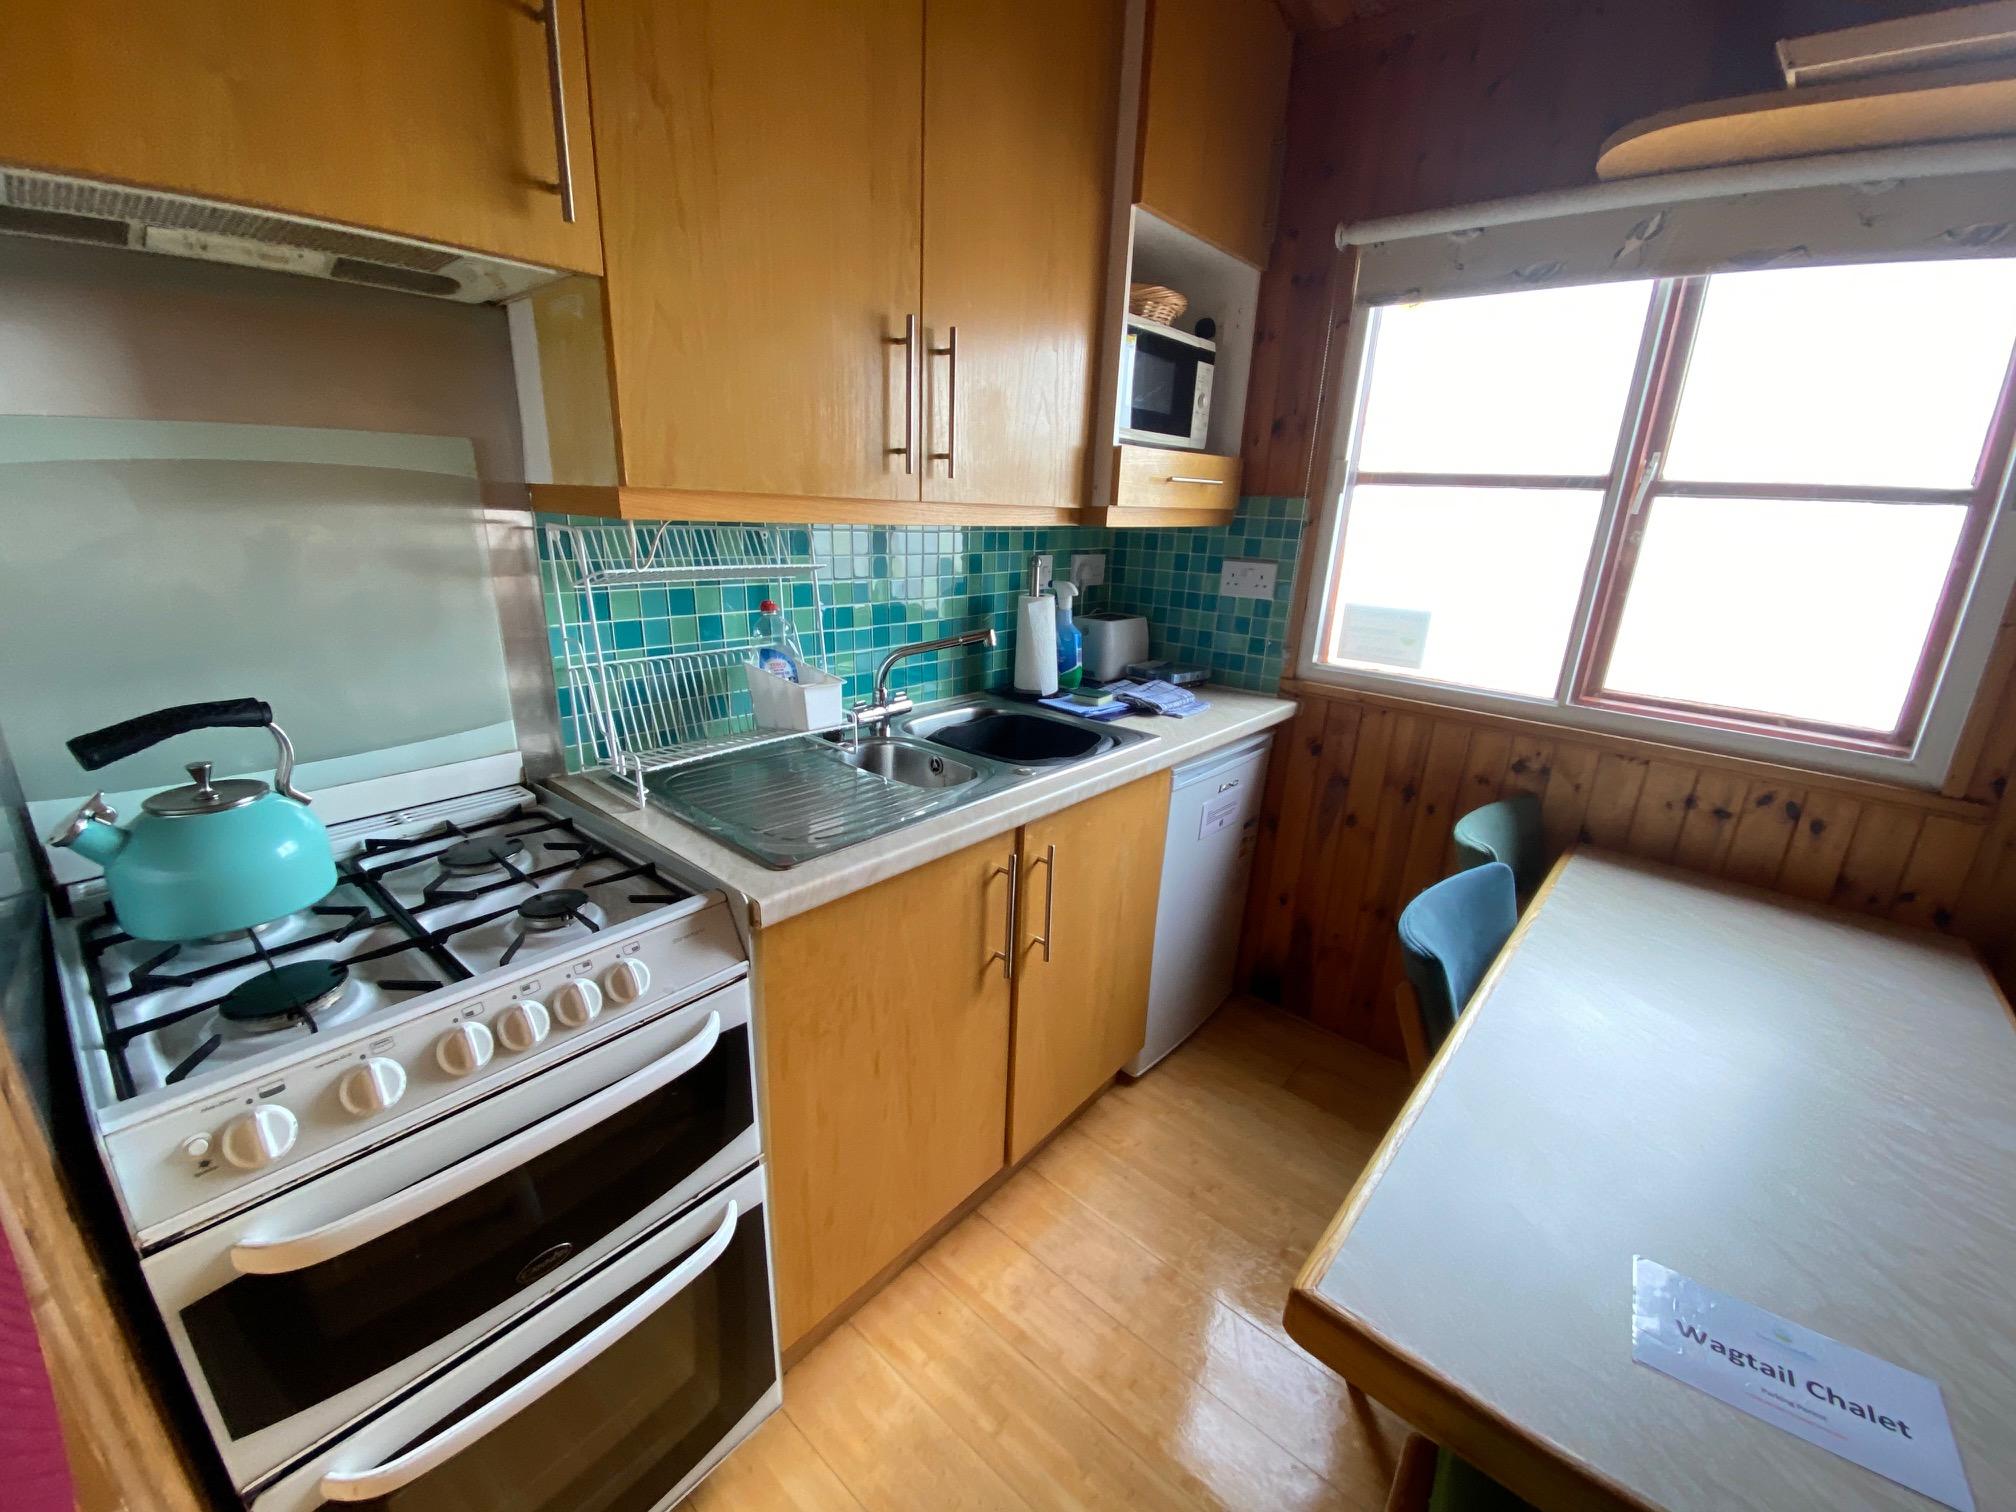 Wagtail Kitchen